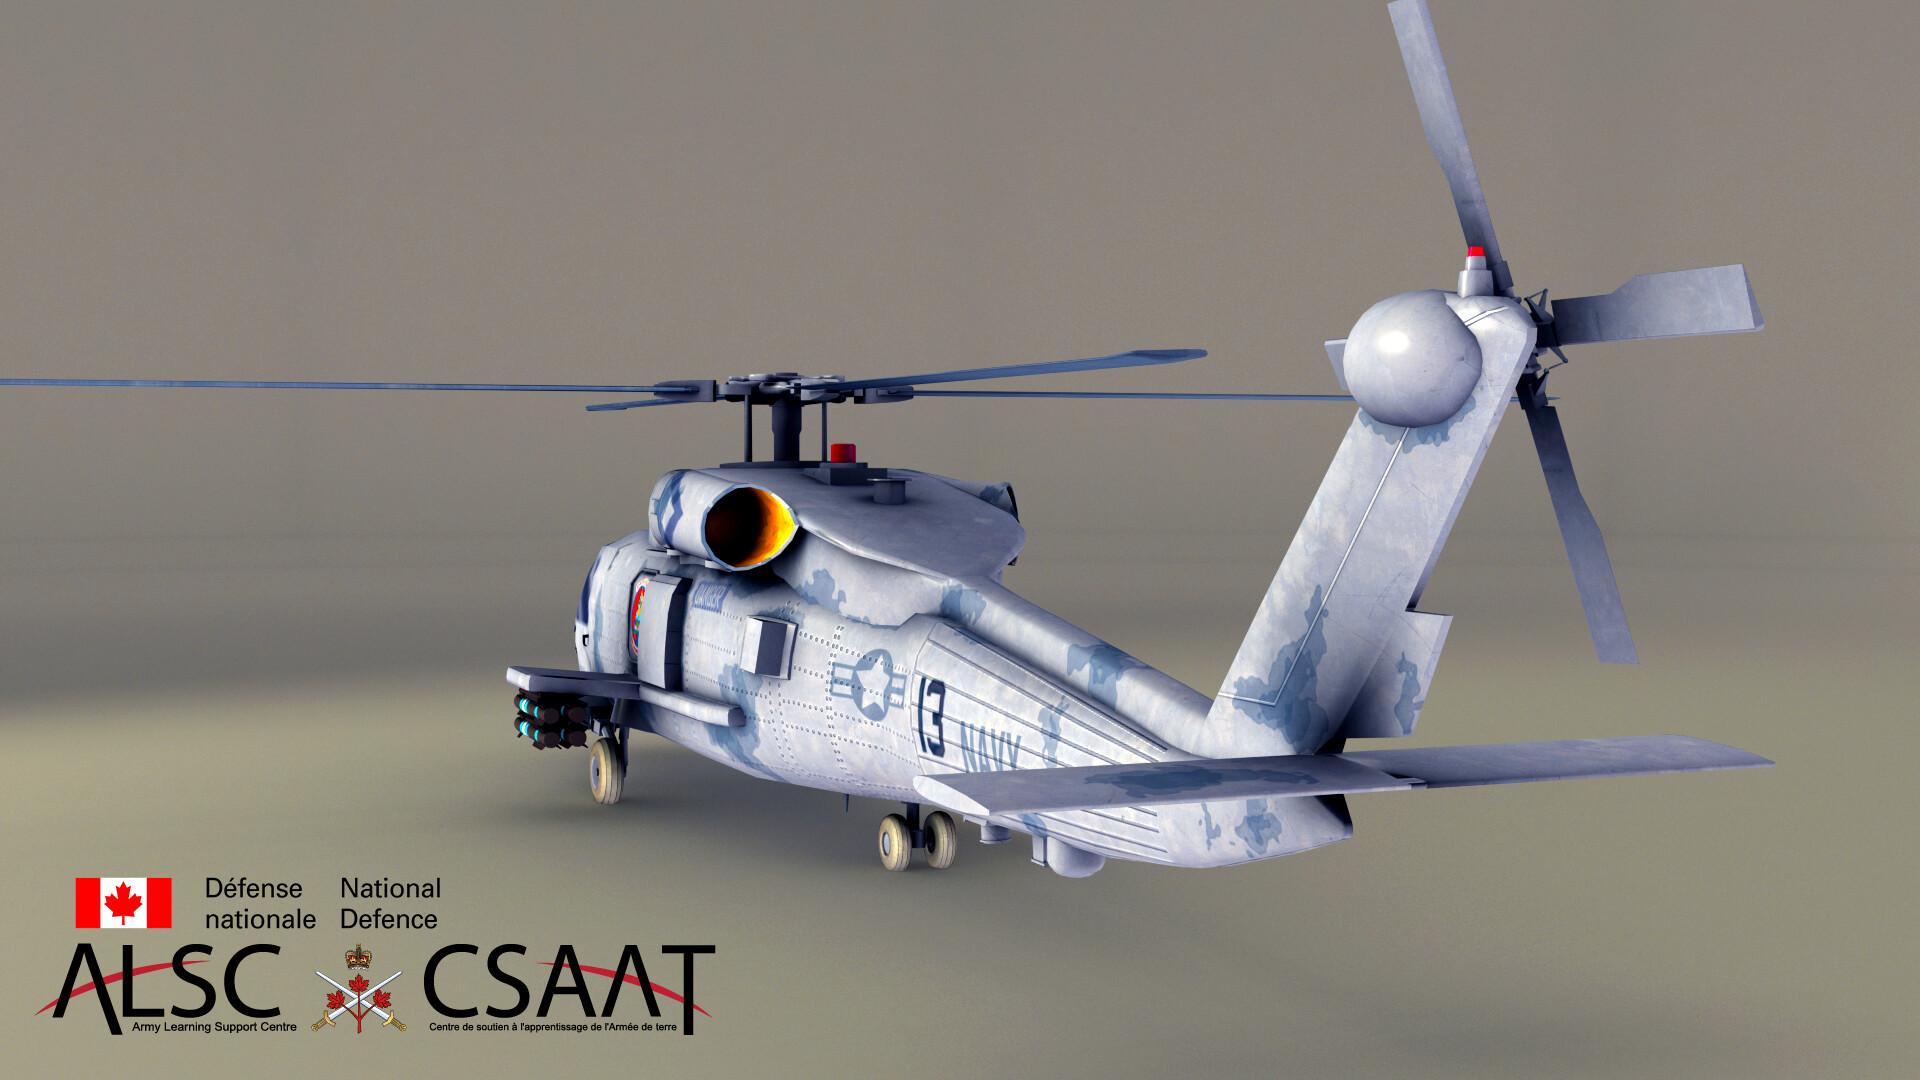 Jordan cameron seahawk alsc 2